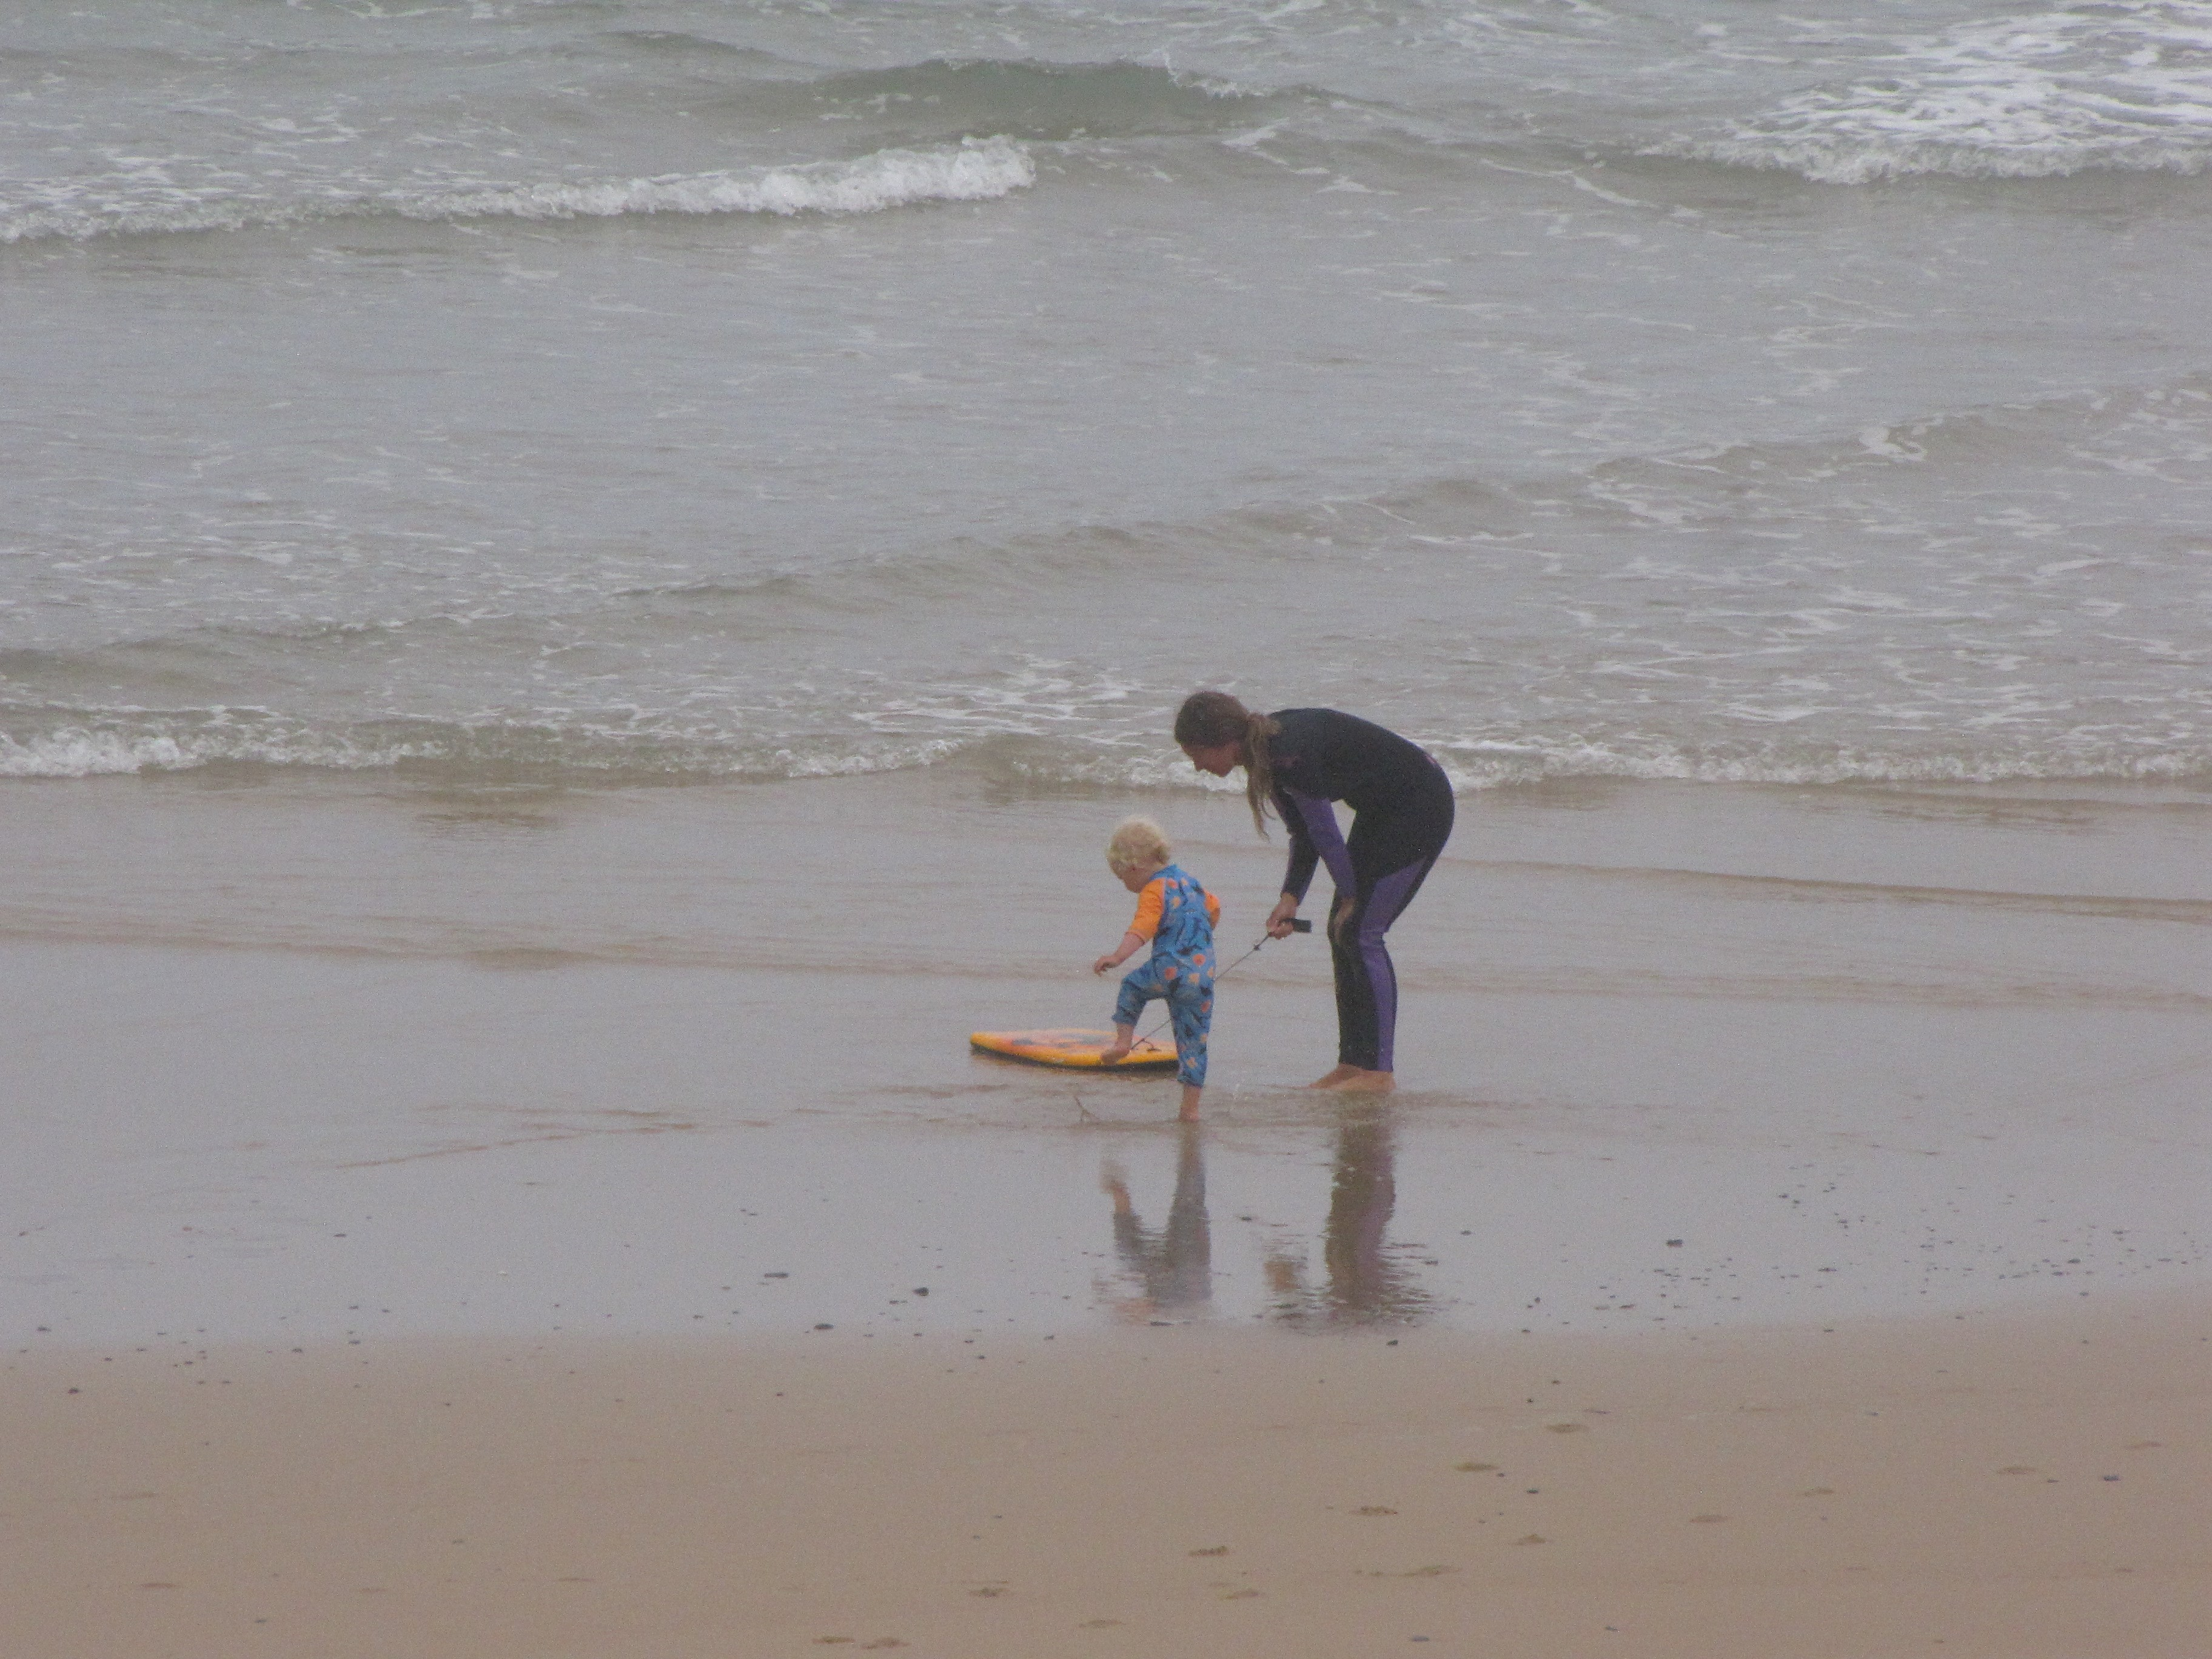 meia praia starting young